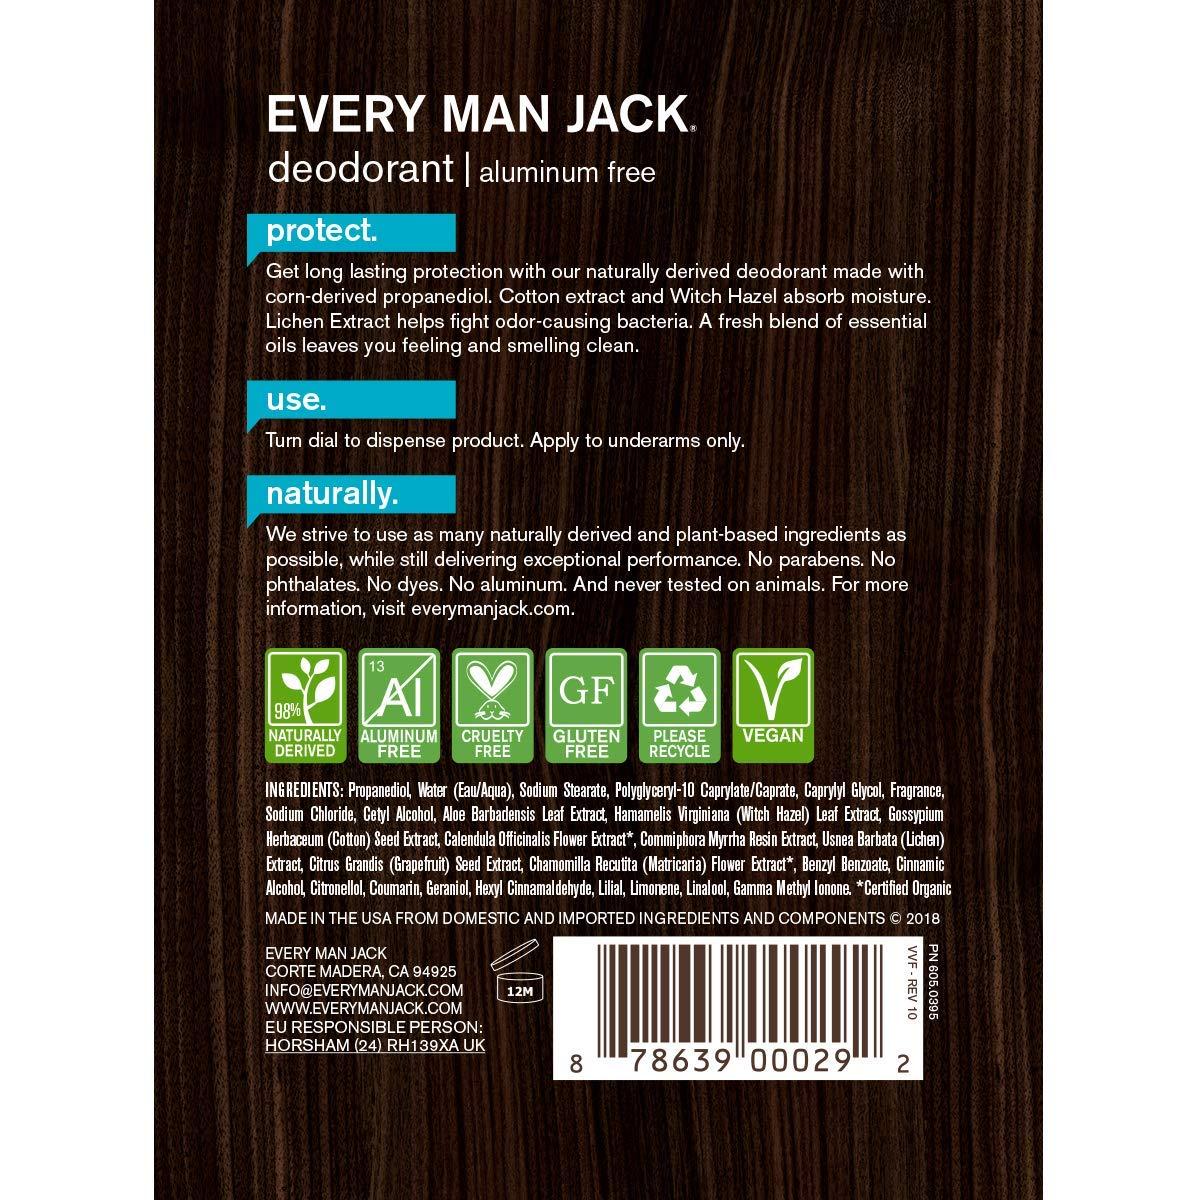 Amazon.com: Deodorante Jack de Every Man: Beauty